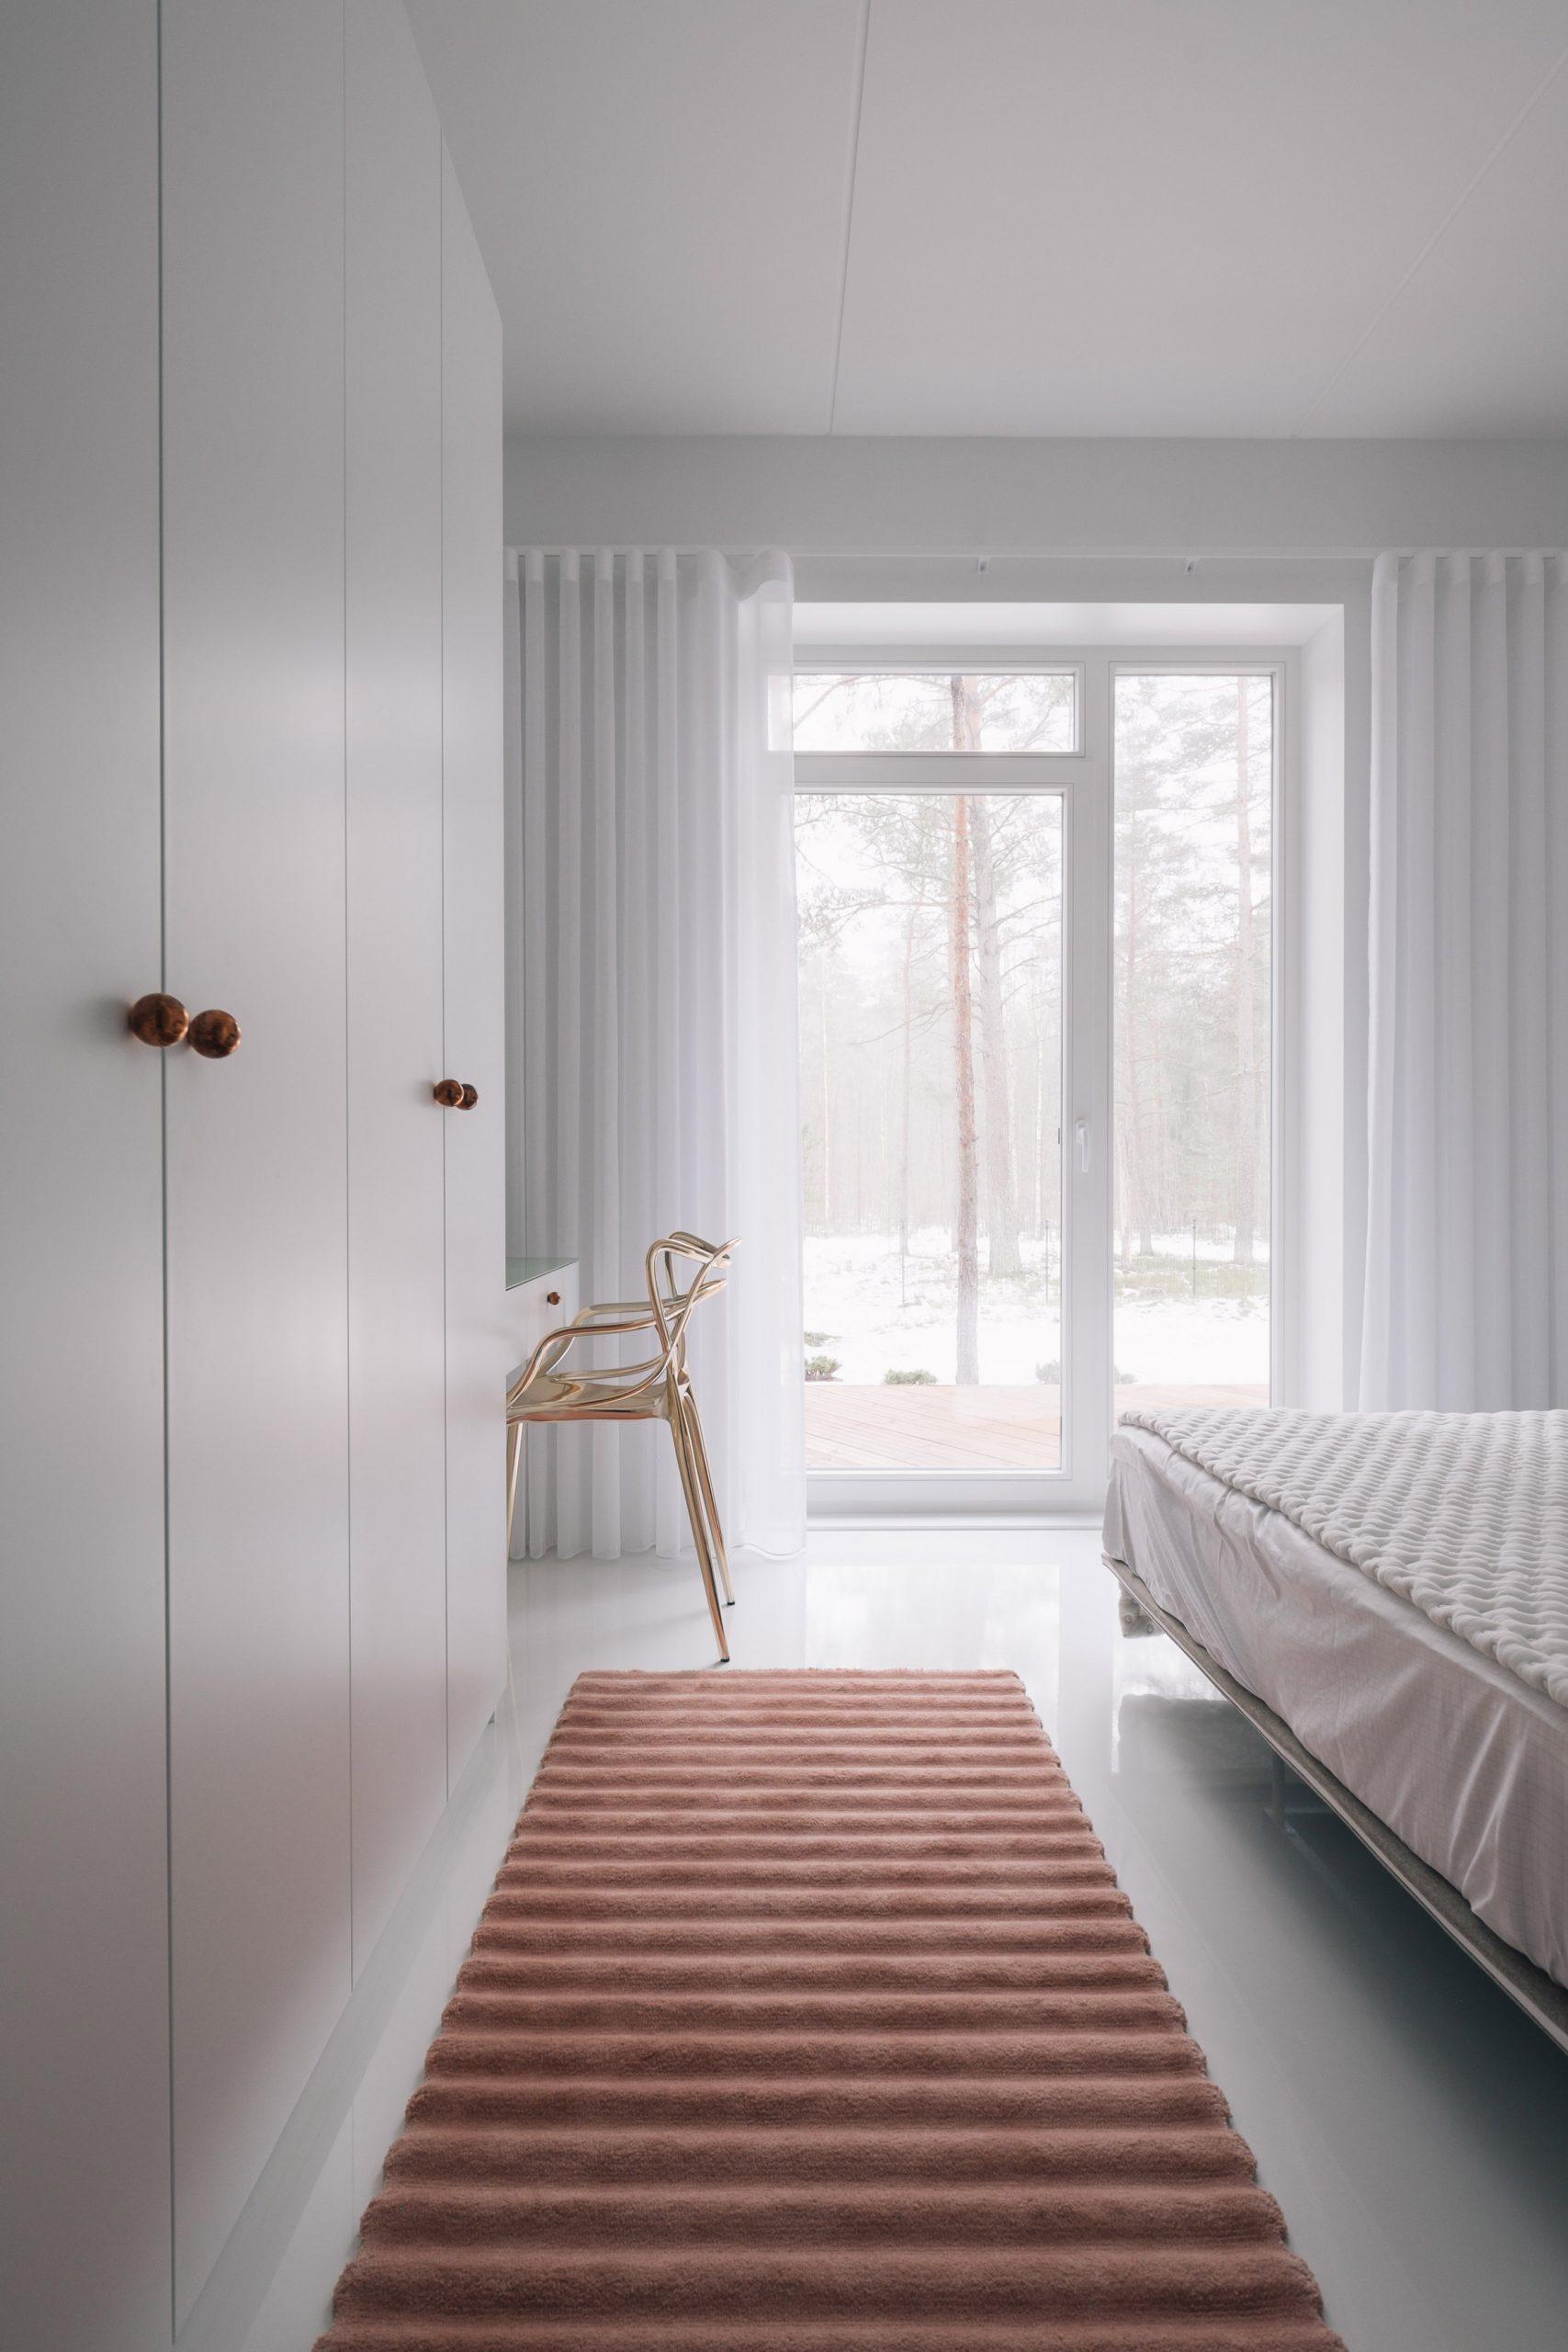 3D Stripe rug by Annike Laigo for NID Store